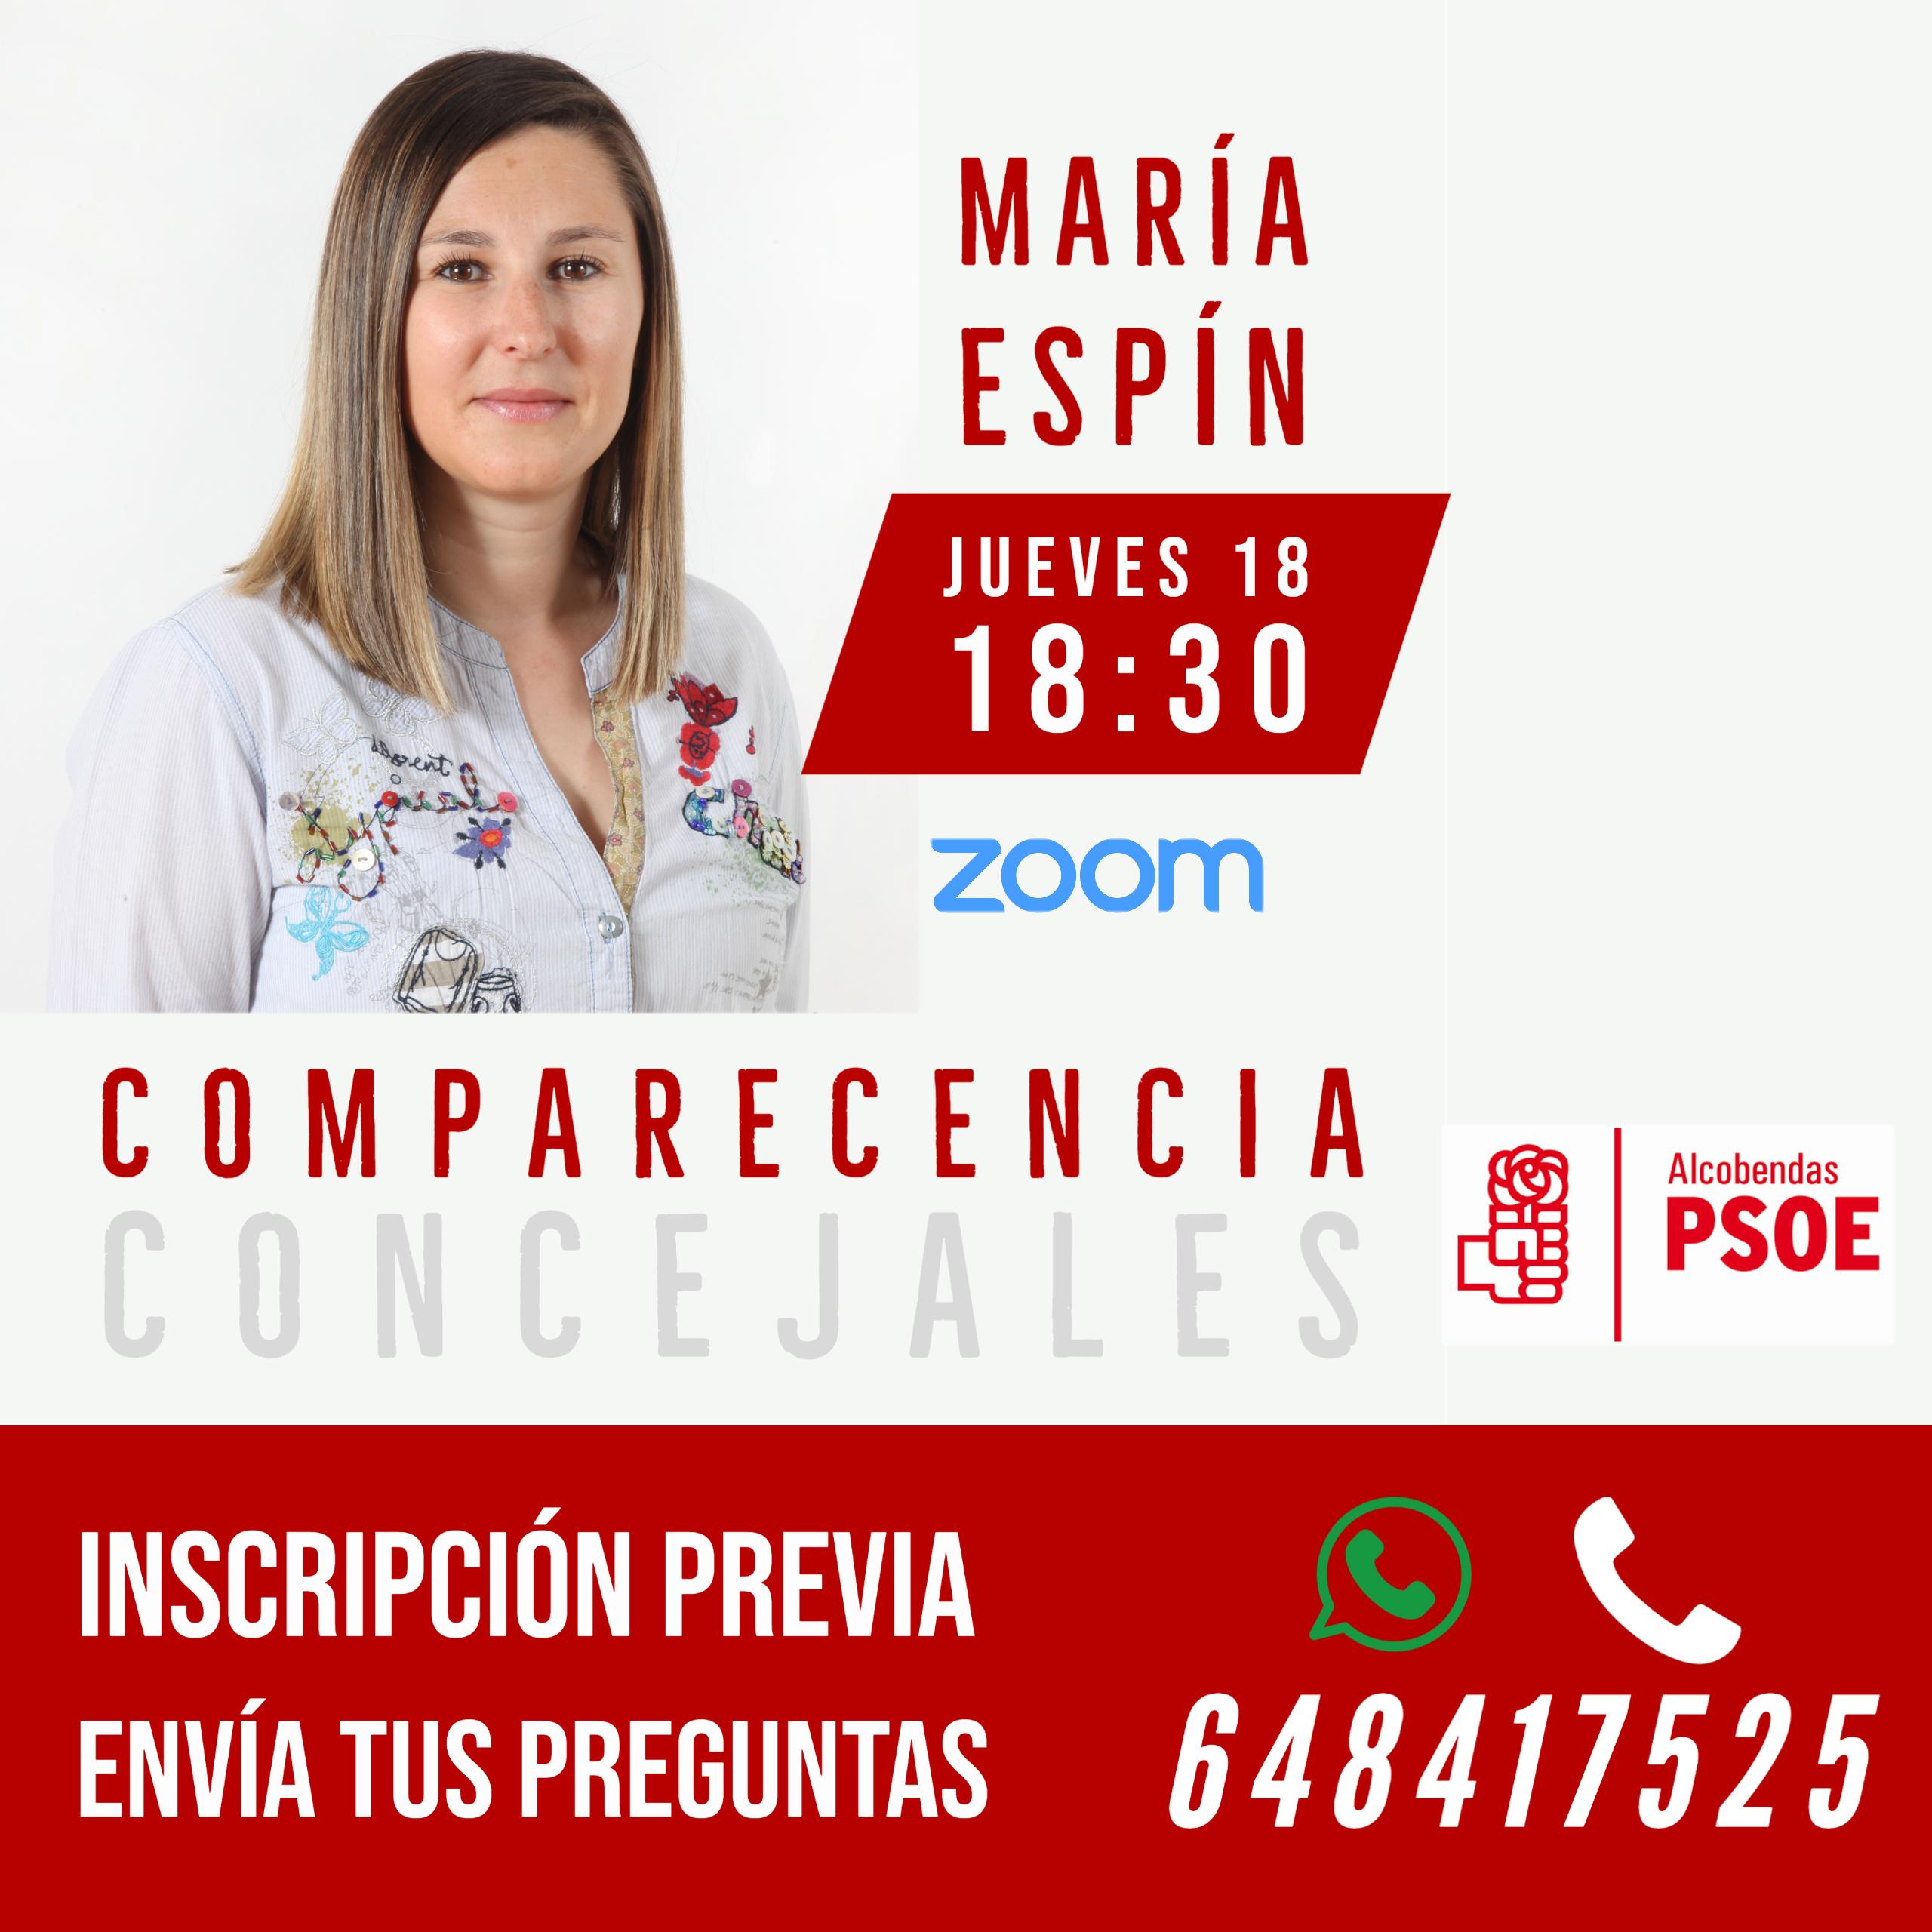 COMPARECENCIA MARIA ESPIN